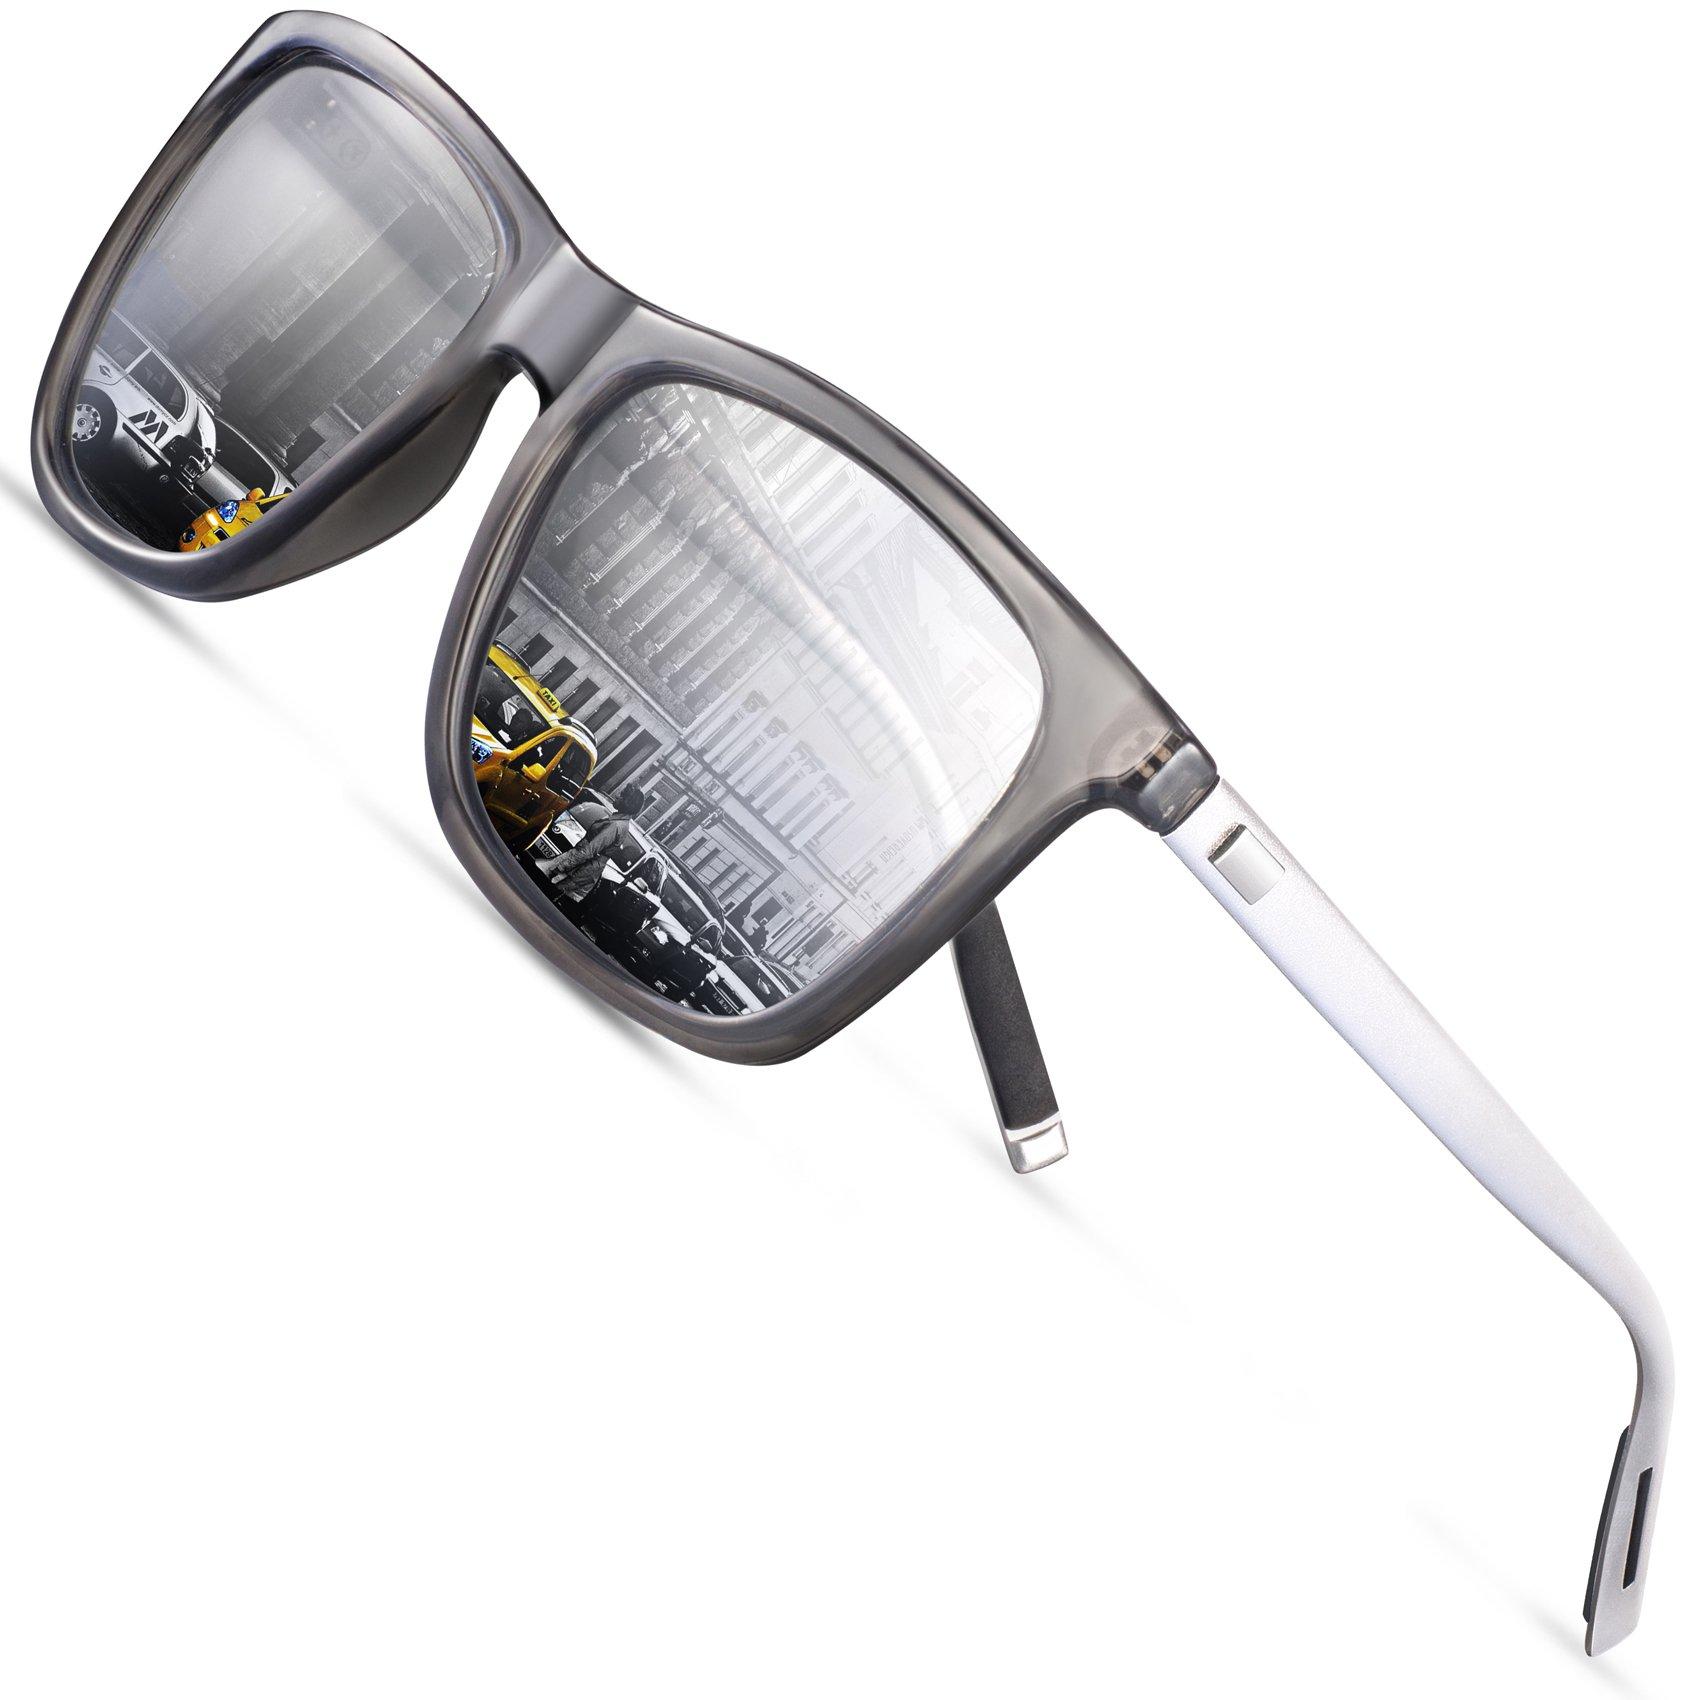 Wayfarer Sunglasses Mens Polarized Sunglasses - FEIDU Polarized Wayfarer Sunglasses UV400 Protective FD9003 (silver, 63)